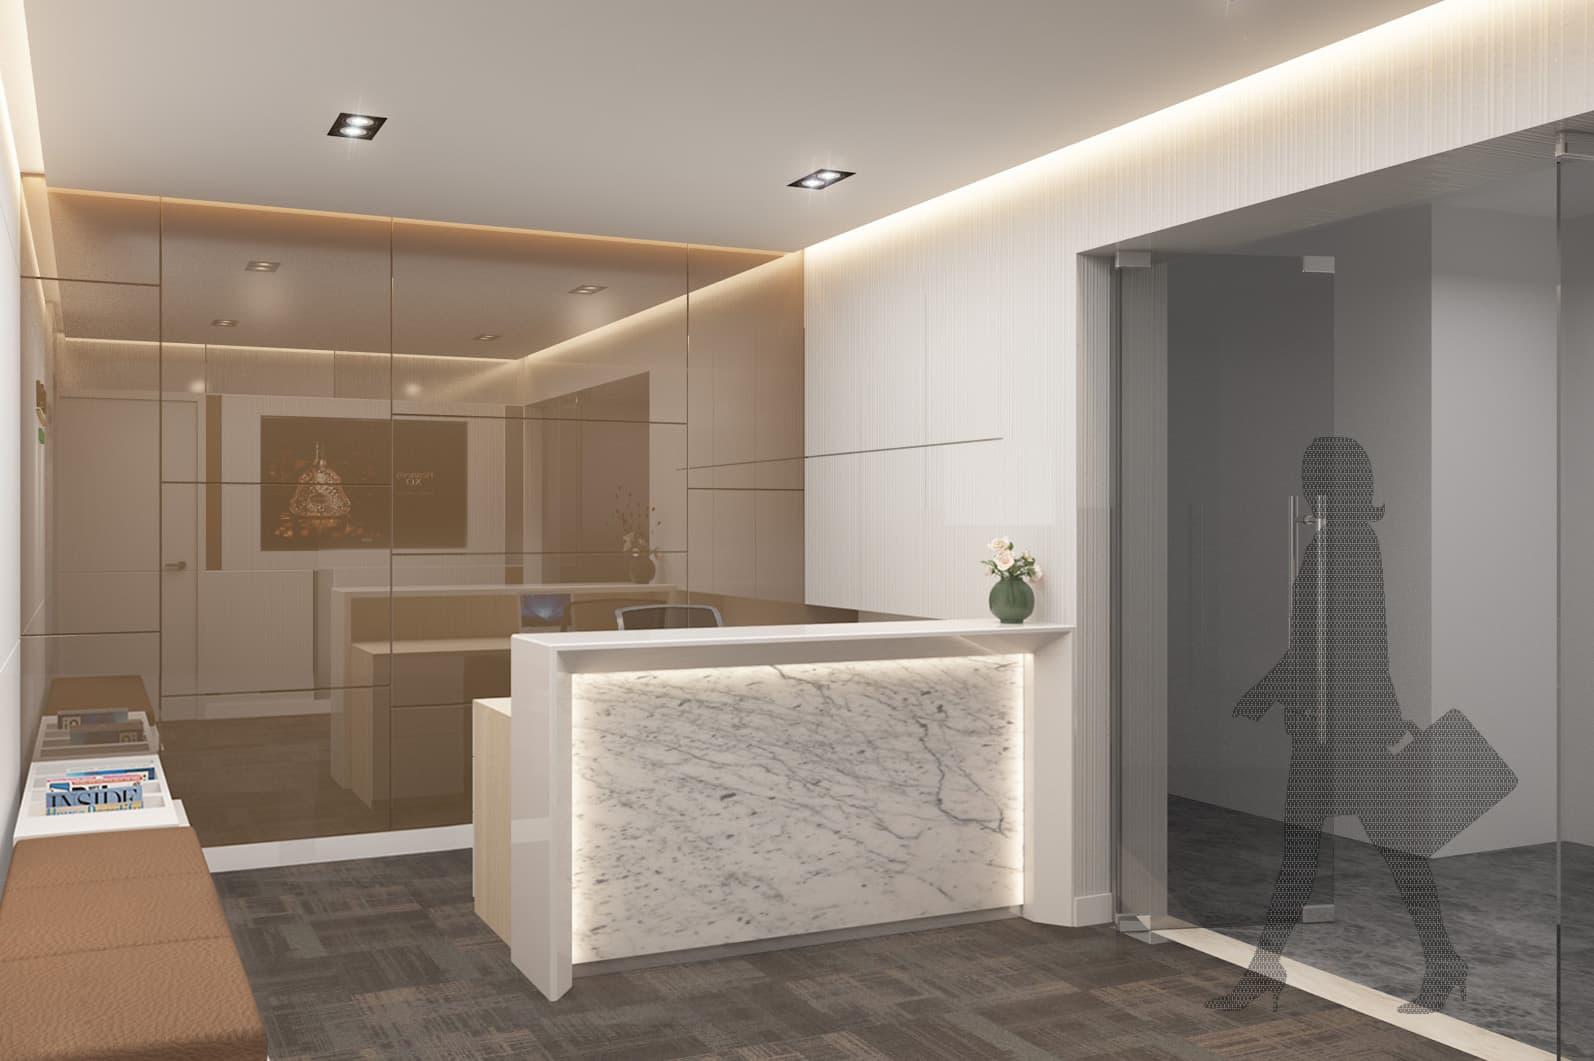 Uffici Moet Hennessy - Design & 3D Rendering